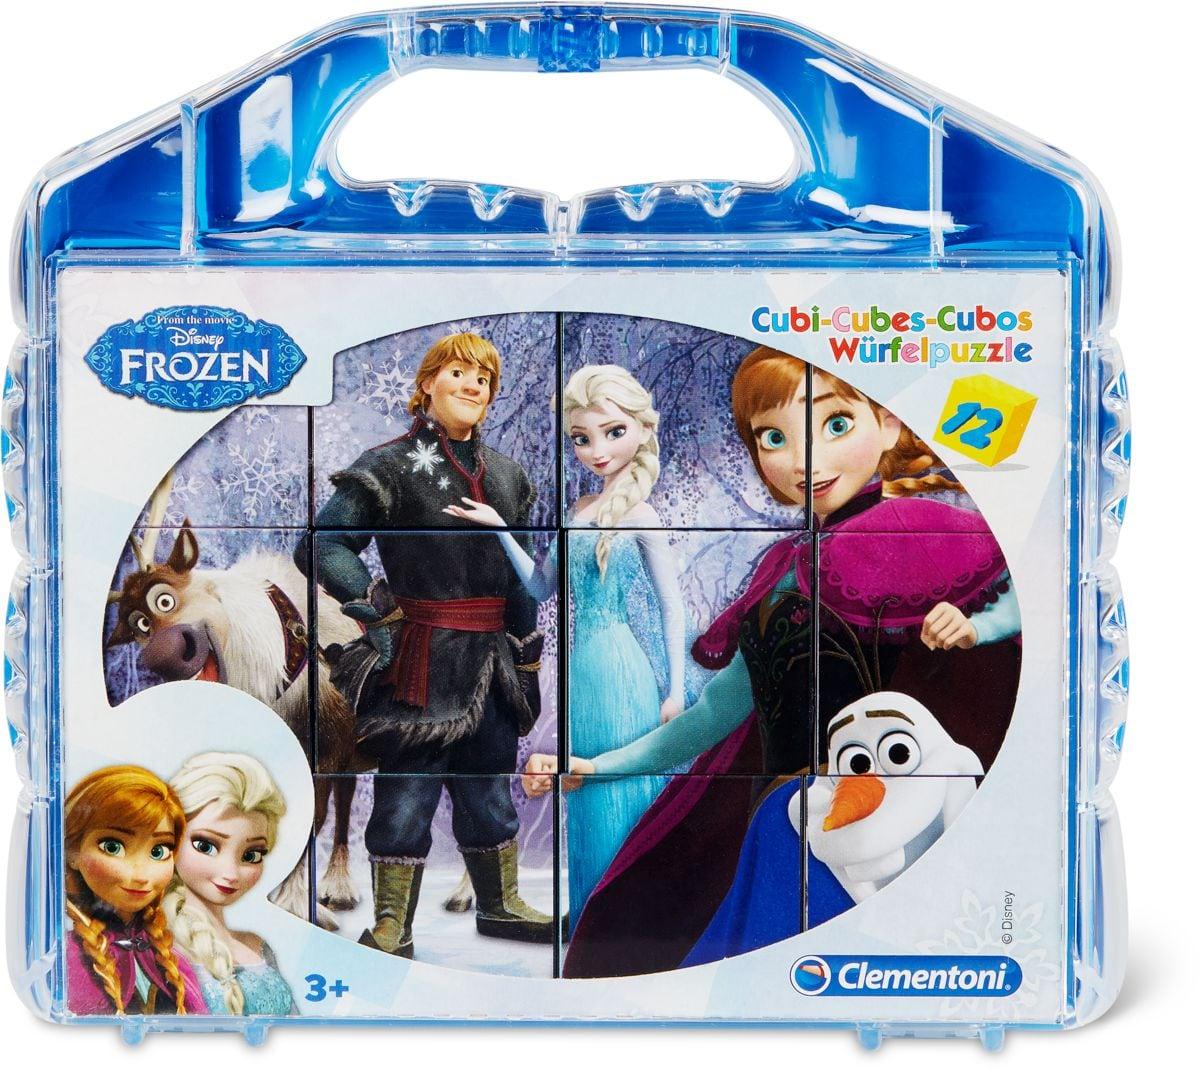 Disney Frozen Würfelpuzzle 12 teilig Puzzle